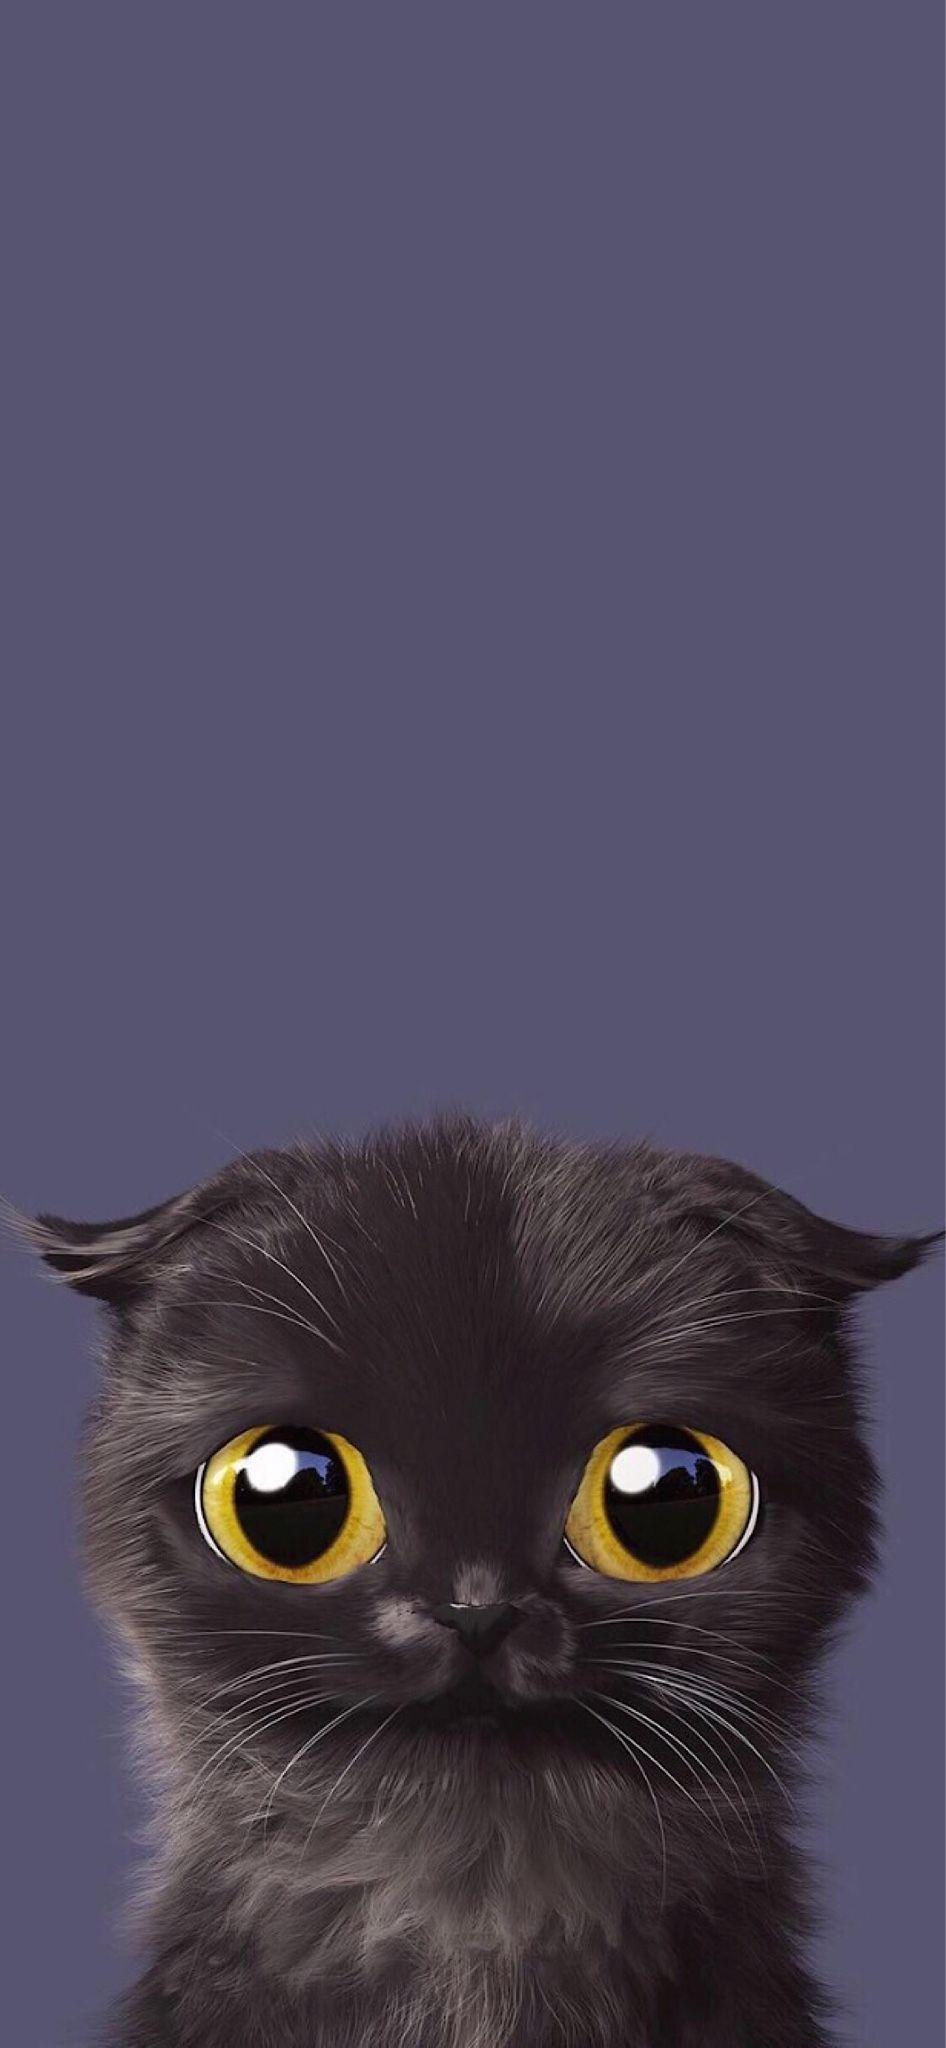 Pin By Lola Bishop On Iphone X Cute Cat Wallpaper Cat Wallpaper Animal Wallpaper